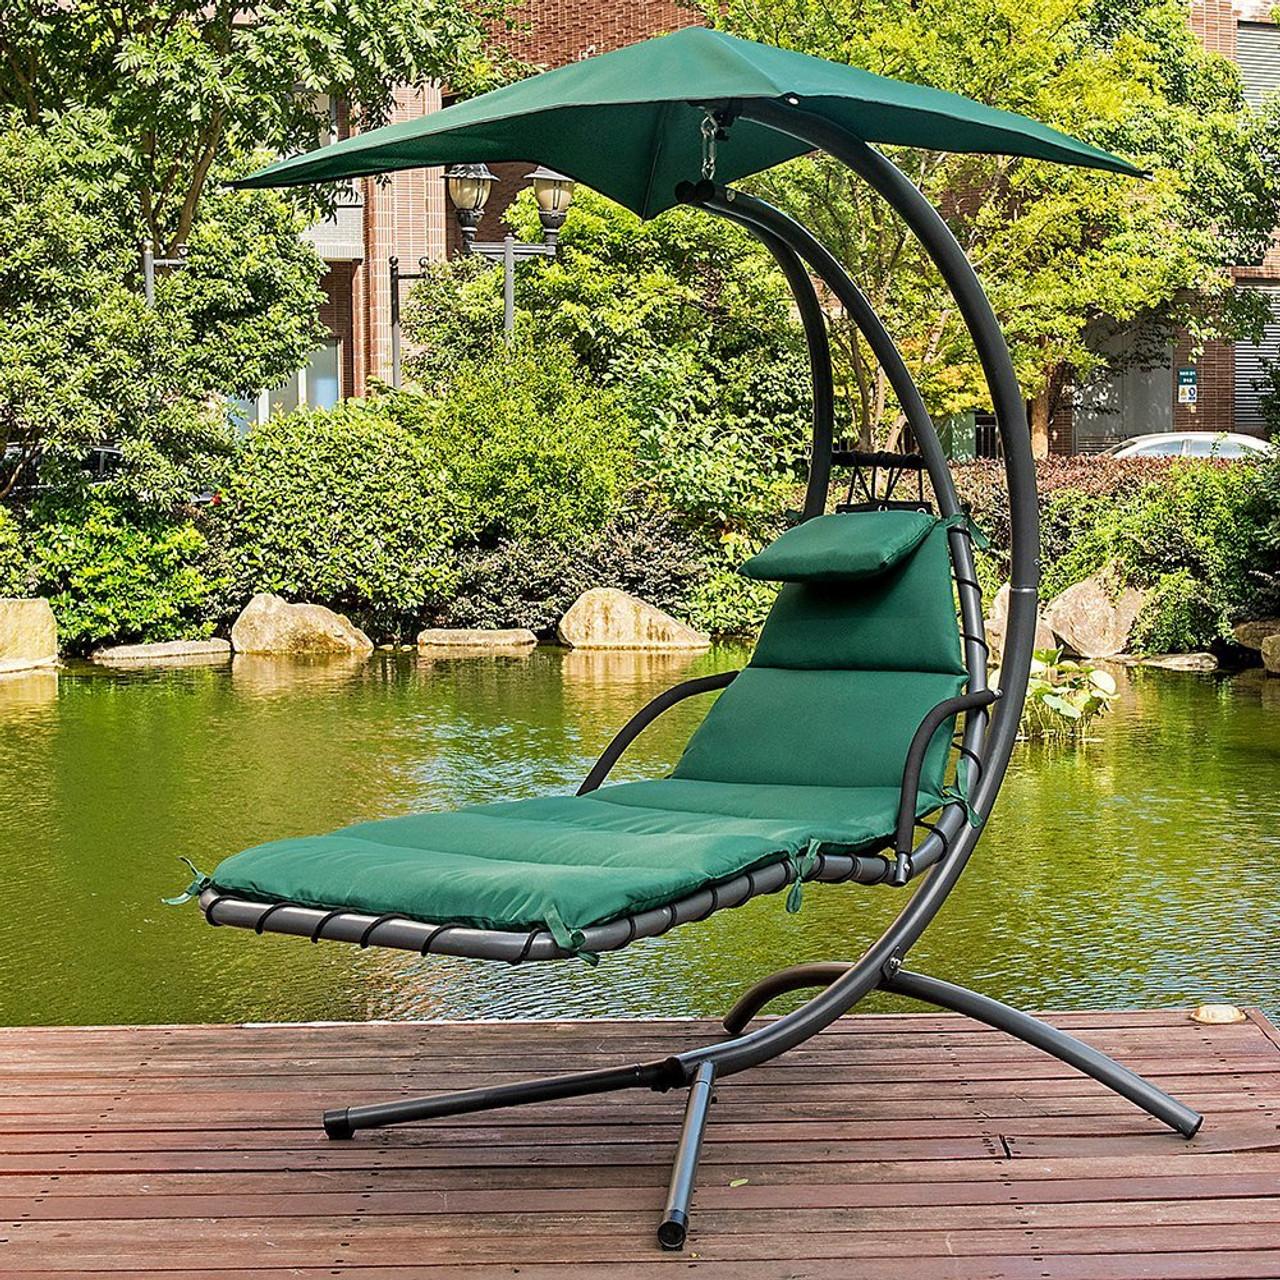 outdoor dream chair gym plus de 50 dark green lazy daze hammocks with umbrella hanging chaise lounge arc curved hammock